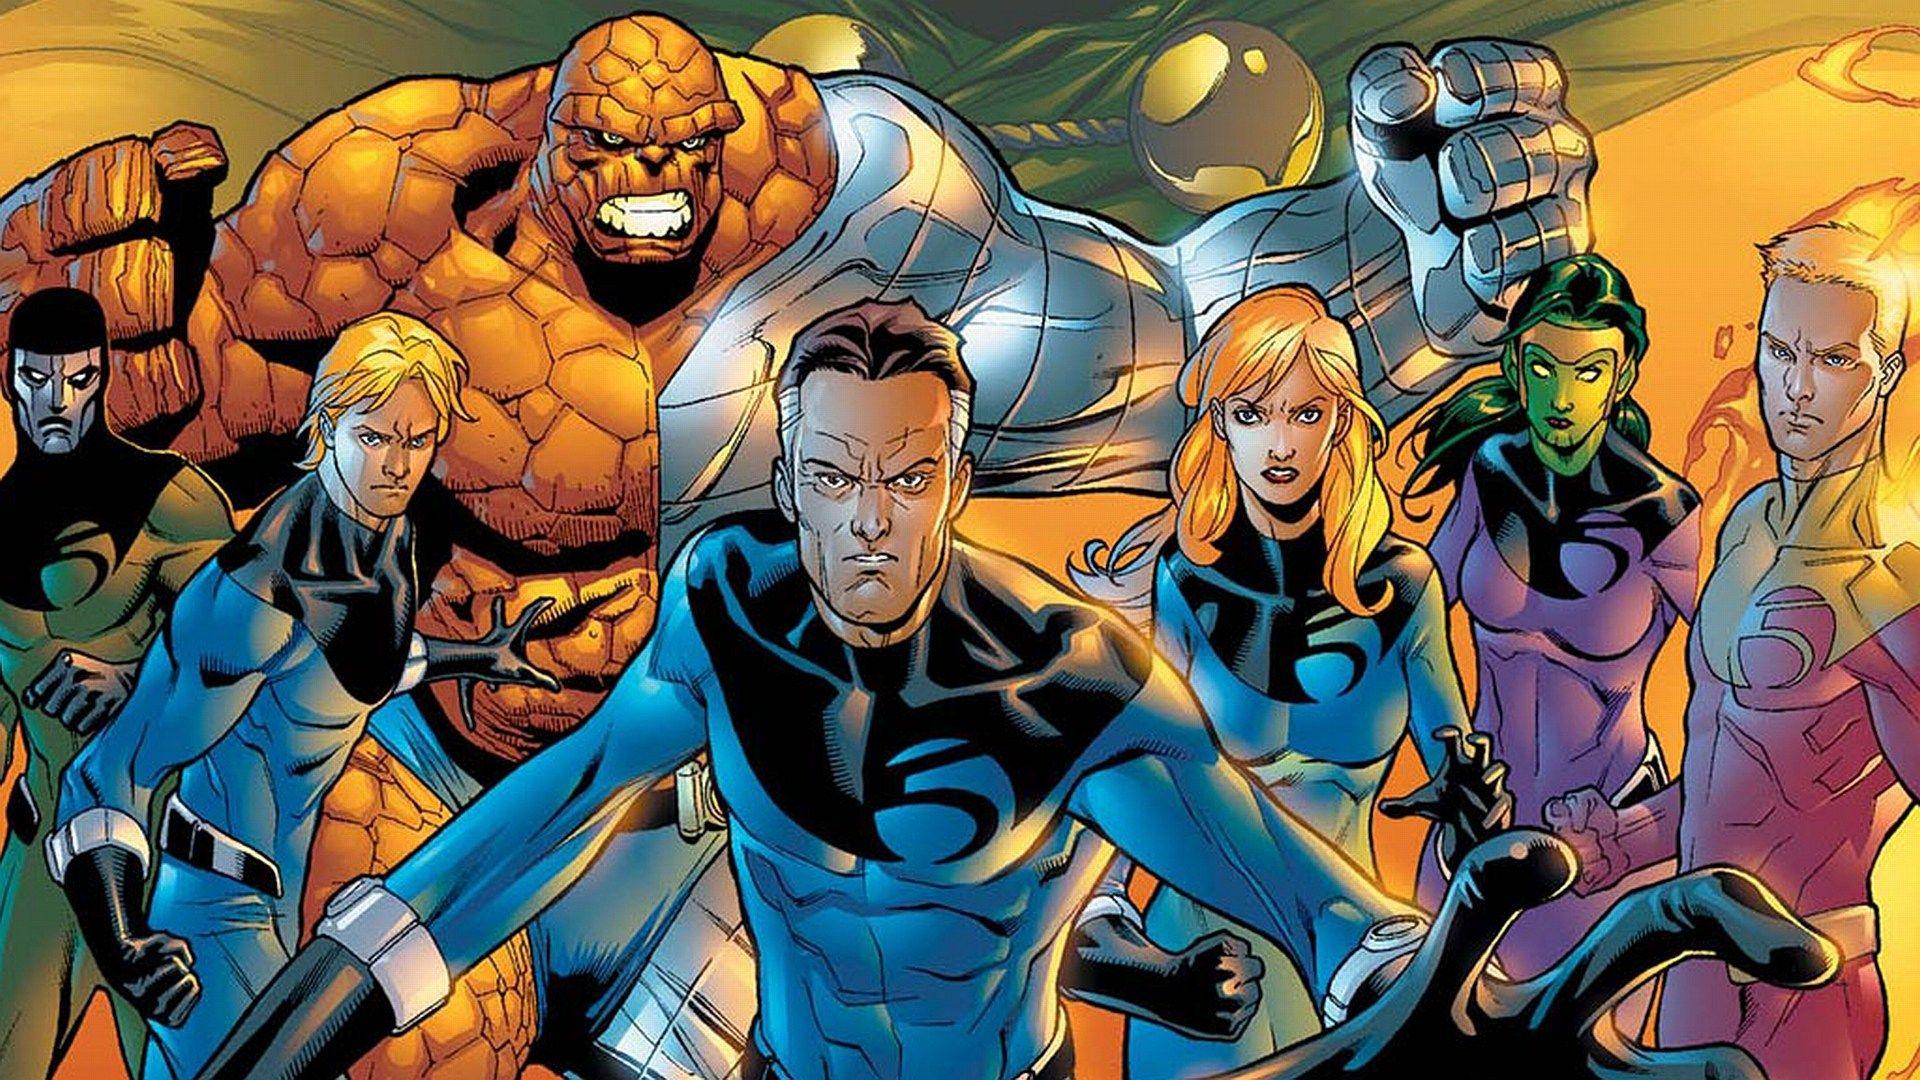 Marvel Wallpapers 4 Epic Heroes 29 x Image Gallery HD